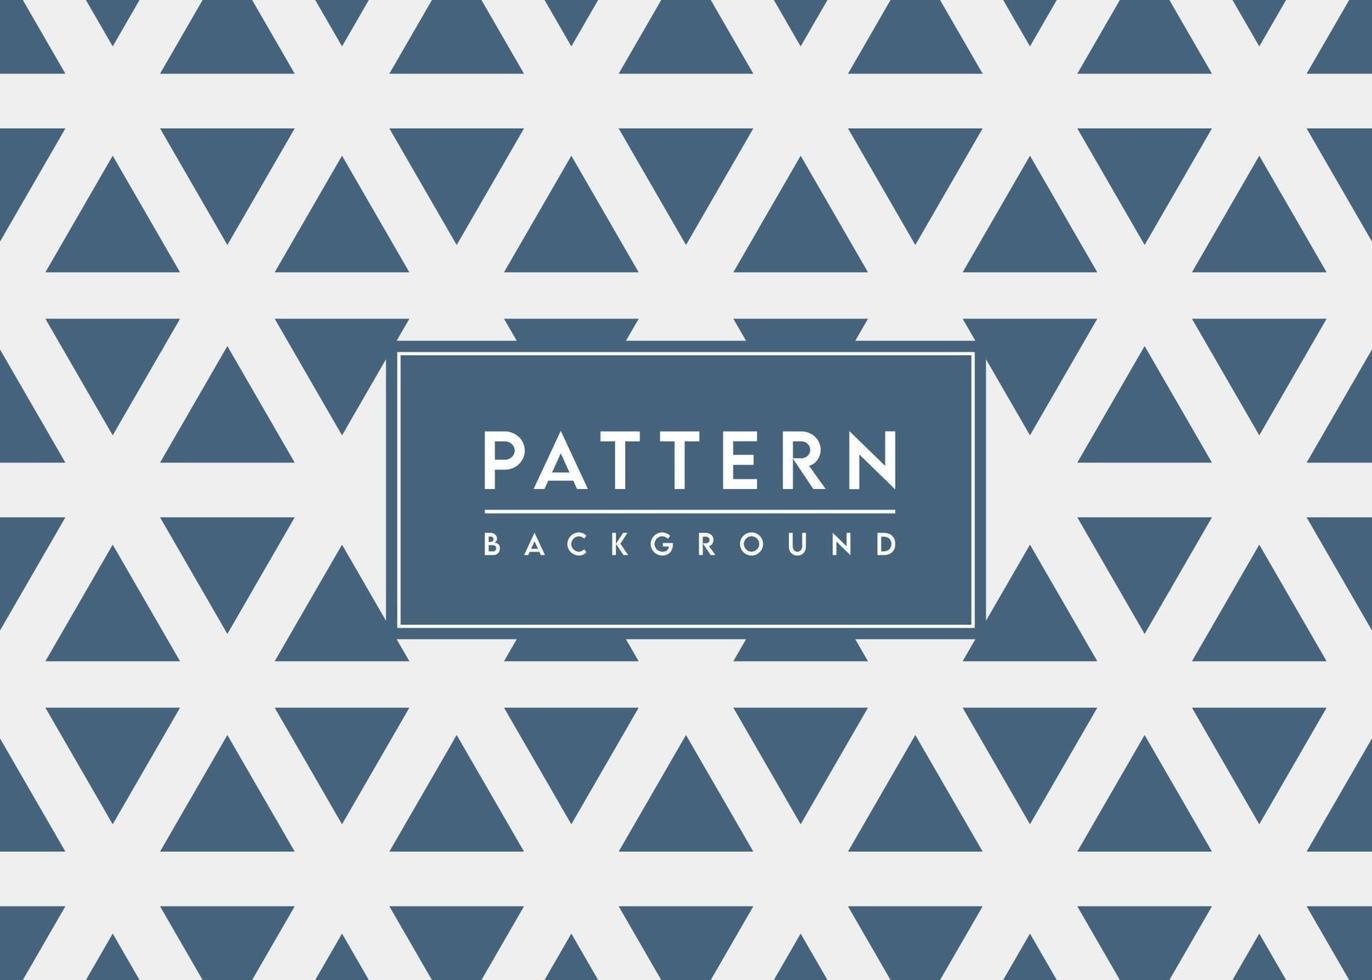 Triangle Pattern Background Textured Vector Design